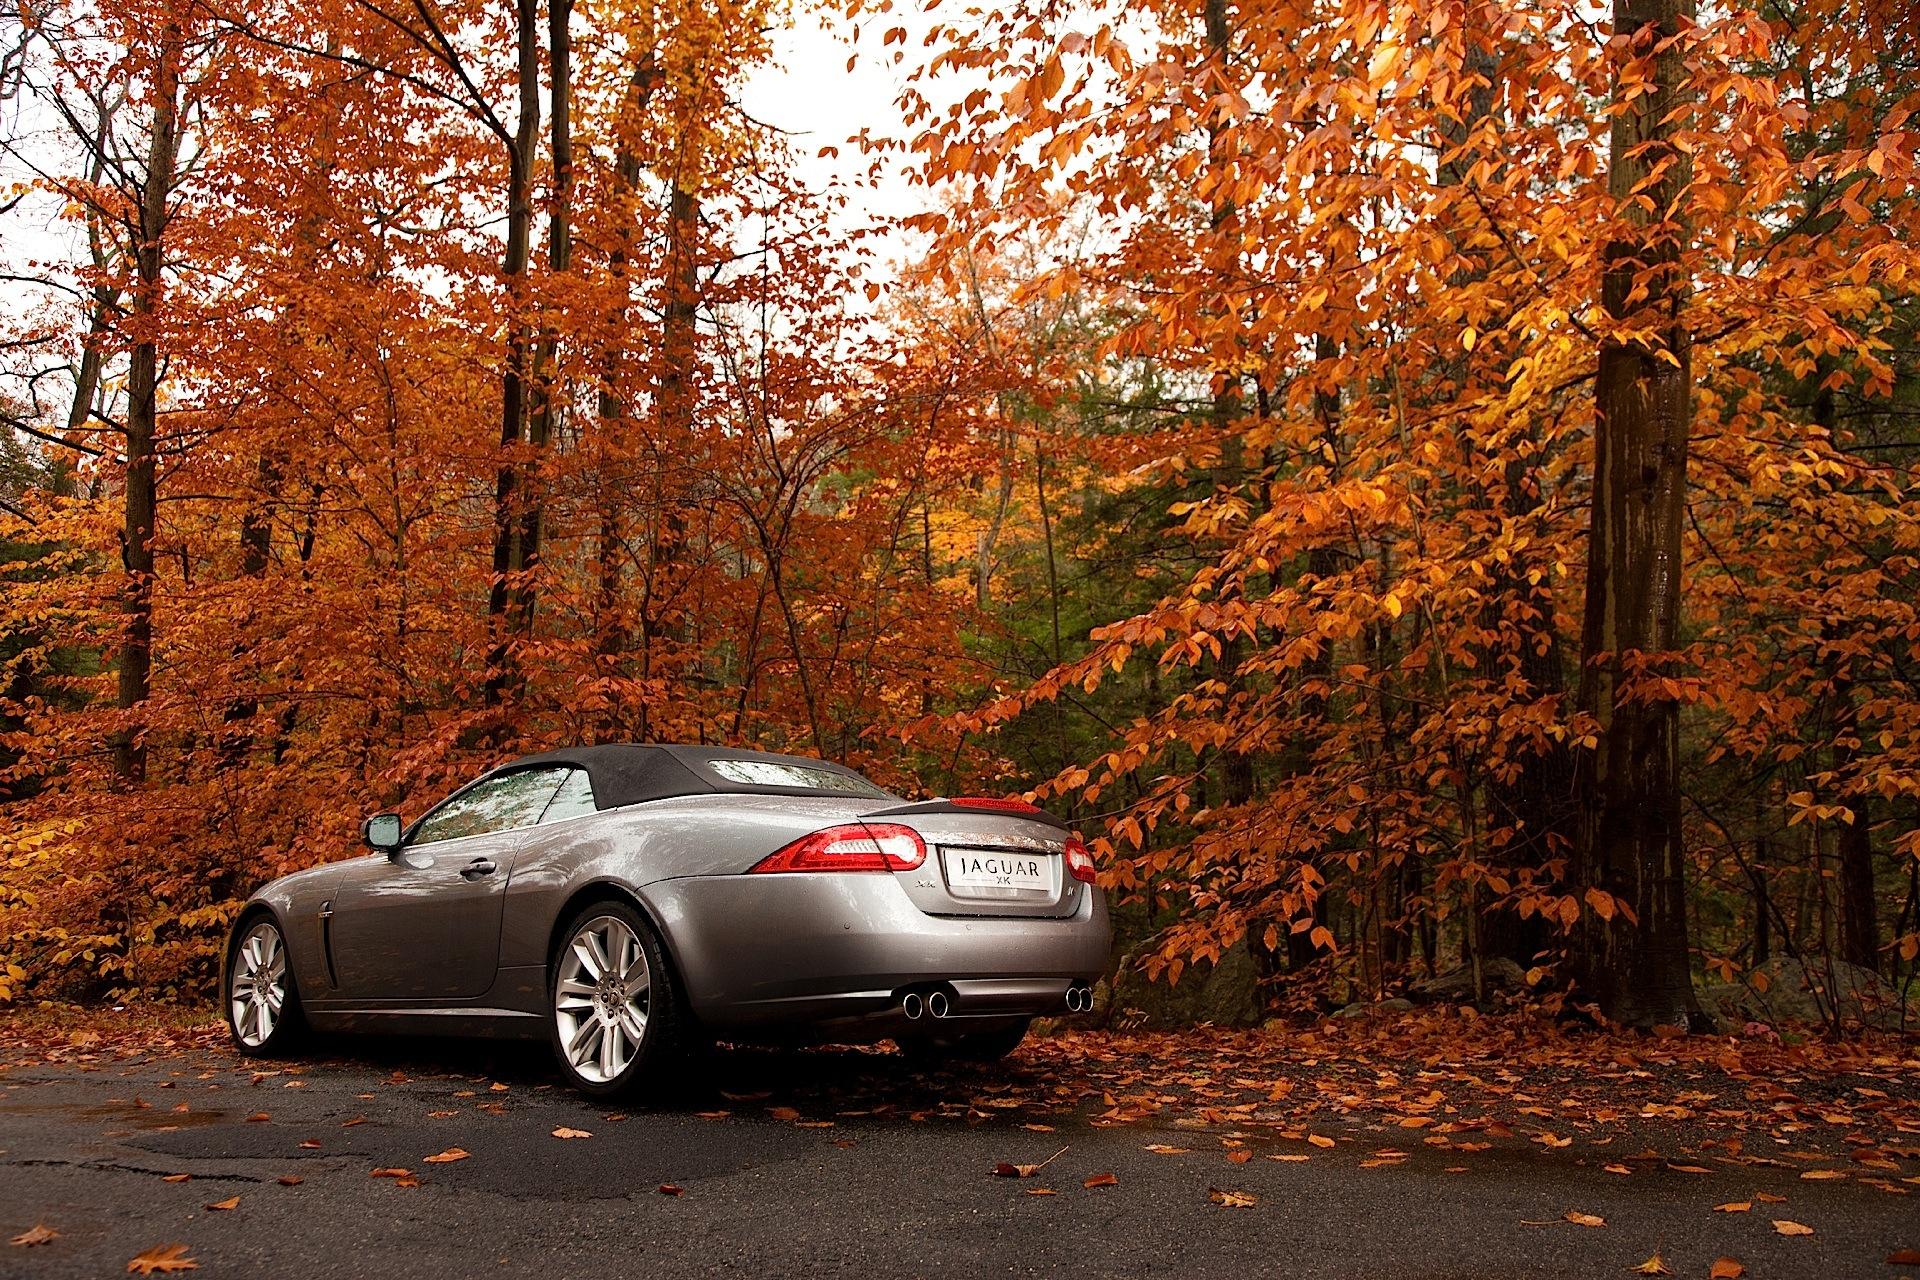 JAGUAR XKR Convertible Specs - 2012 jaguar xkr specs